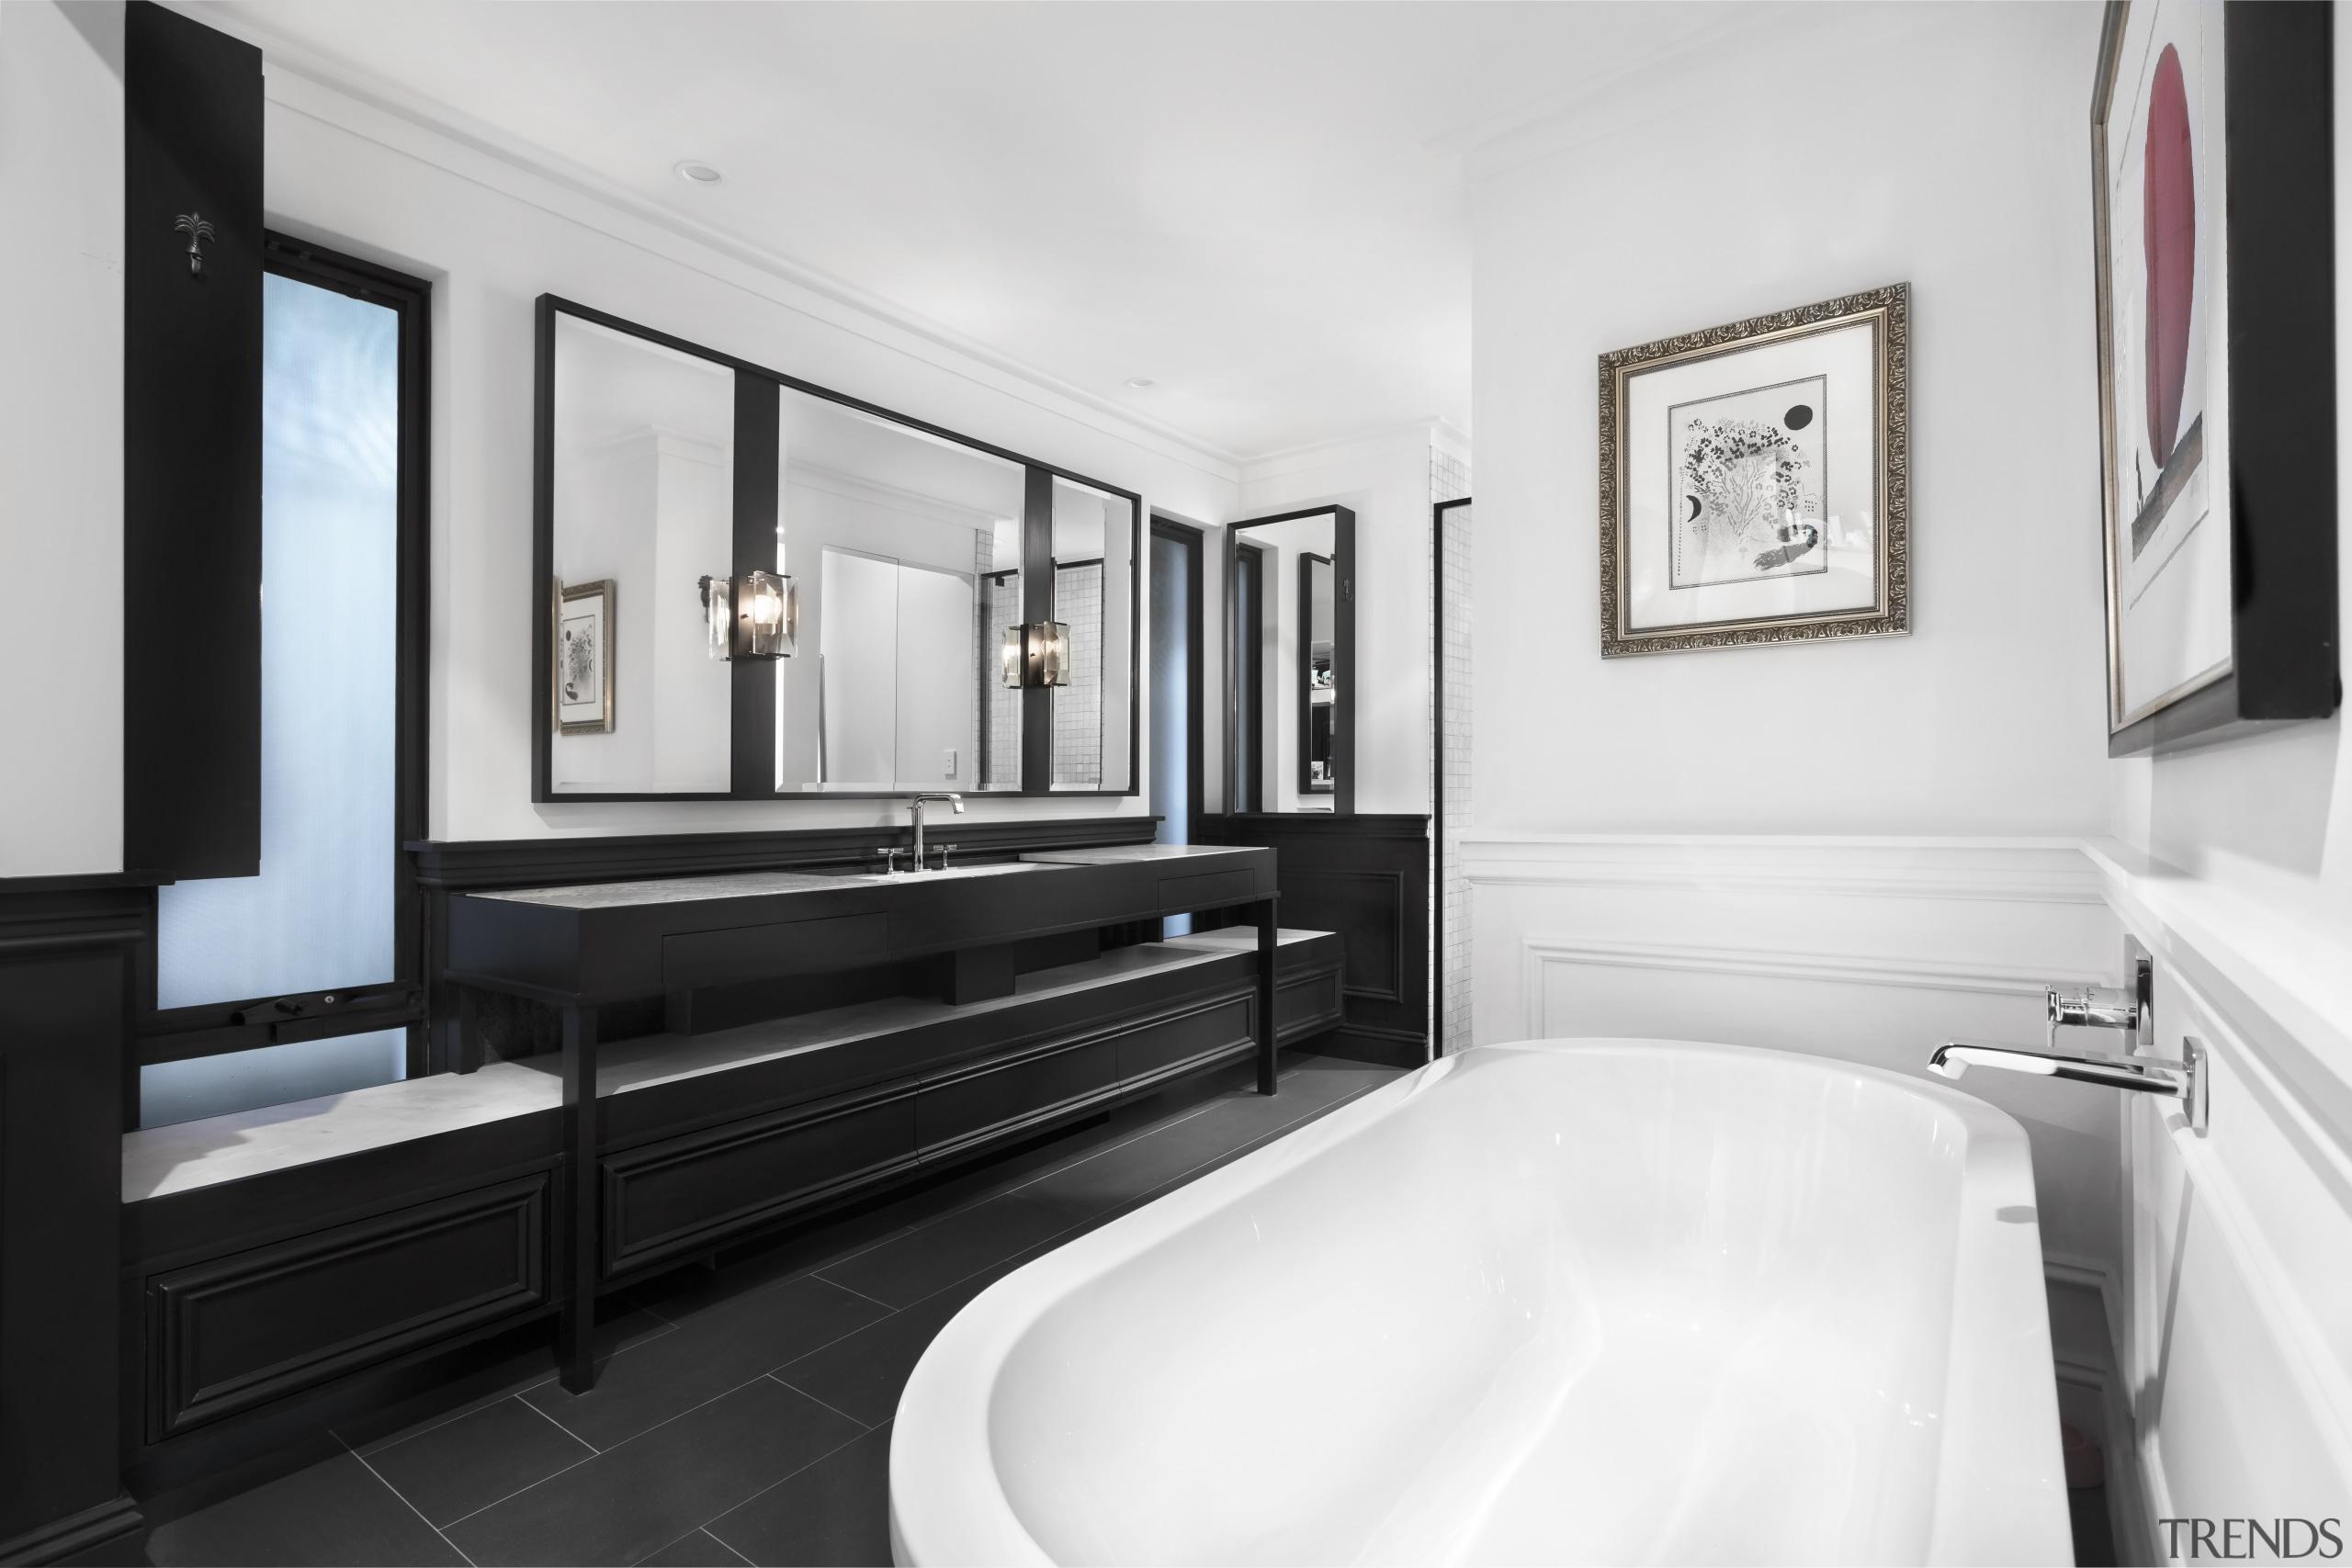 Nz3405Leonhouse–268574082–05 - bathroom   floor   interior design bathroom, floor, interior design, room, suite, white, black